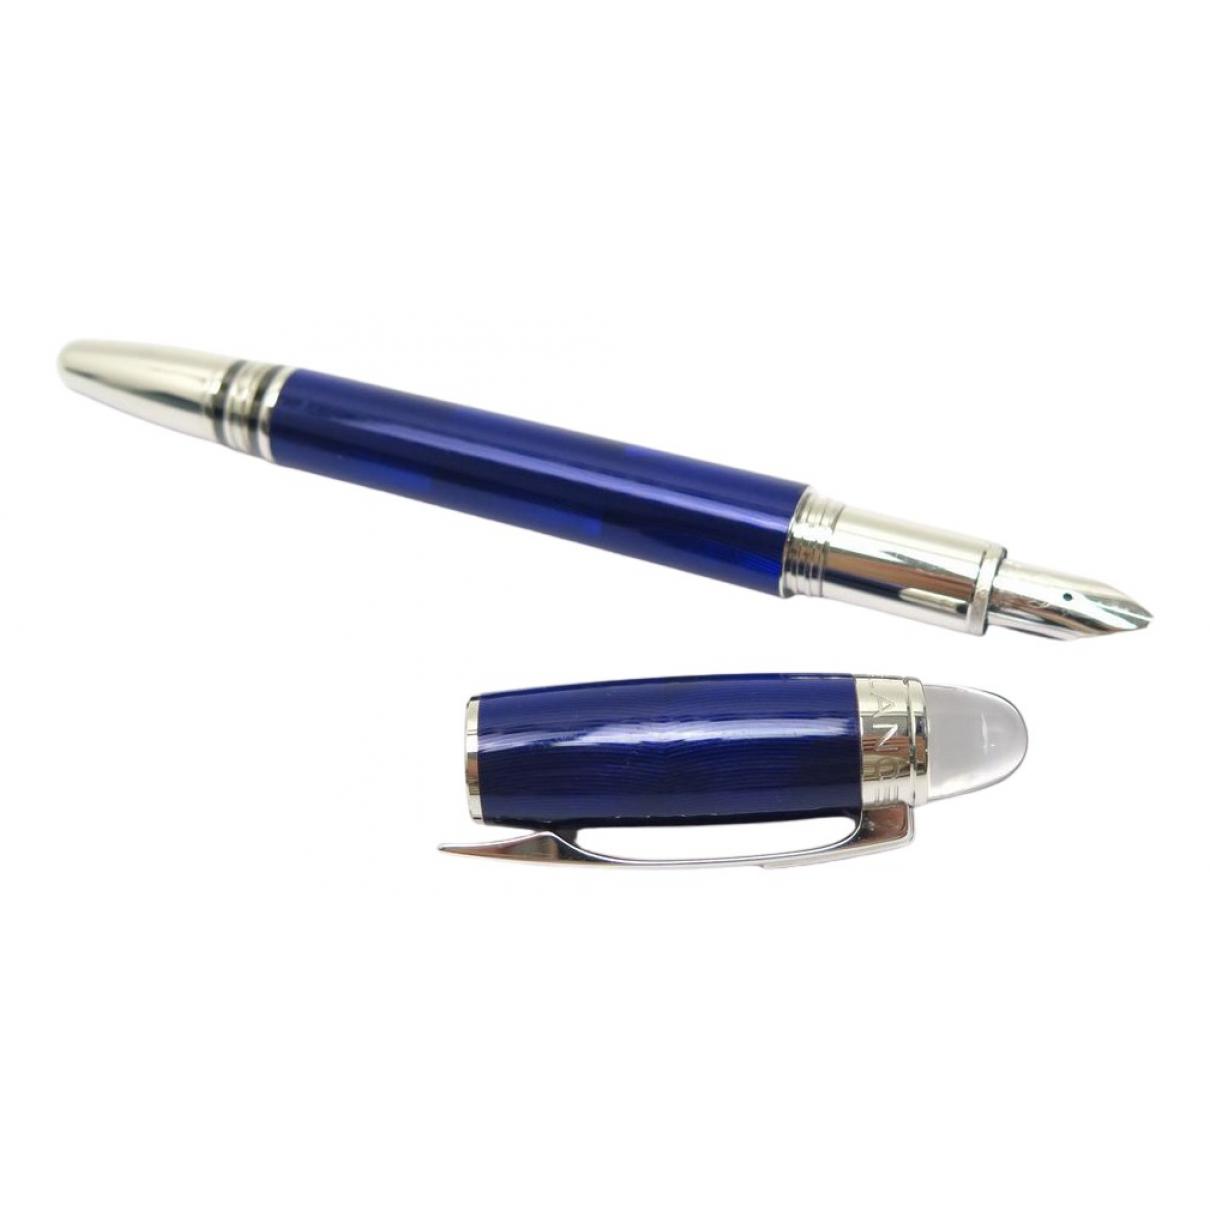 Montblanc - Objets & Deco StarWalker pour lifestyle - bleu